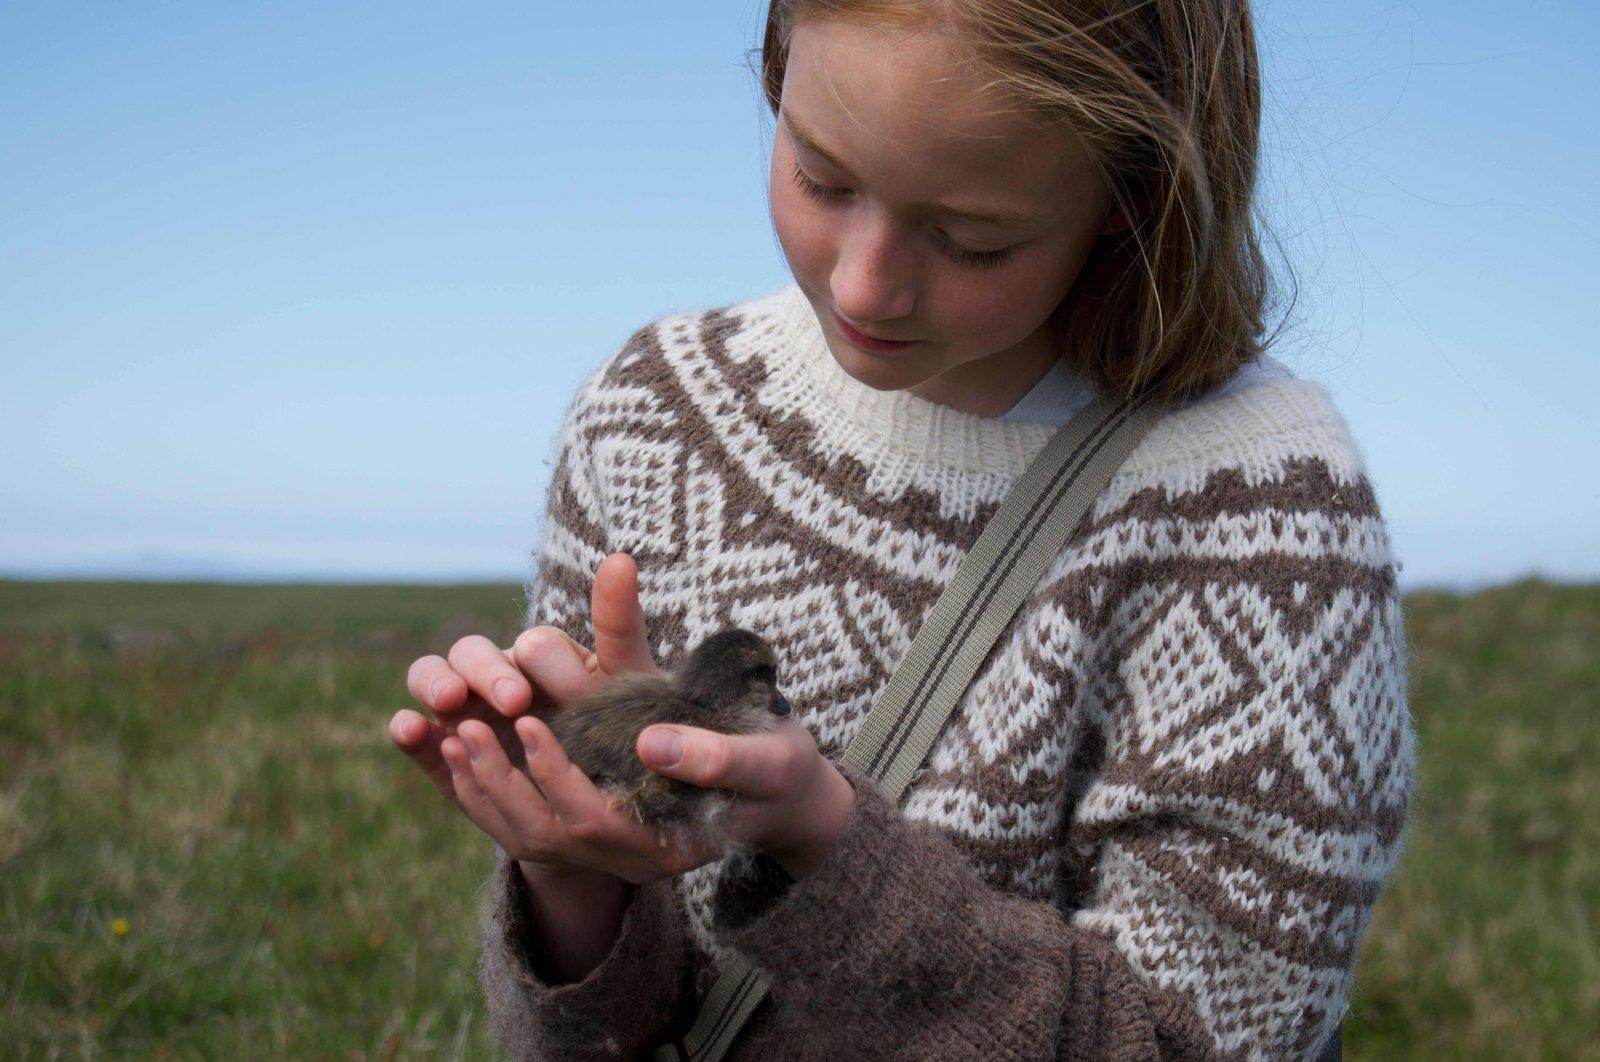 11-years-old Bryndis Jonsdottir, Erla Fridriksdottirís niece, cuddles an eider duckling on the Bjarneyjar island in Breidafjordur Bay, Iceland, July 4, 2021. (AFP Photo)